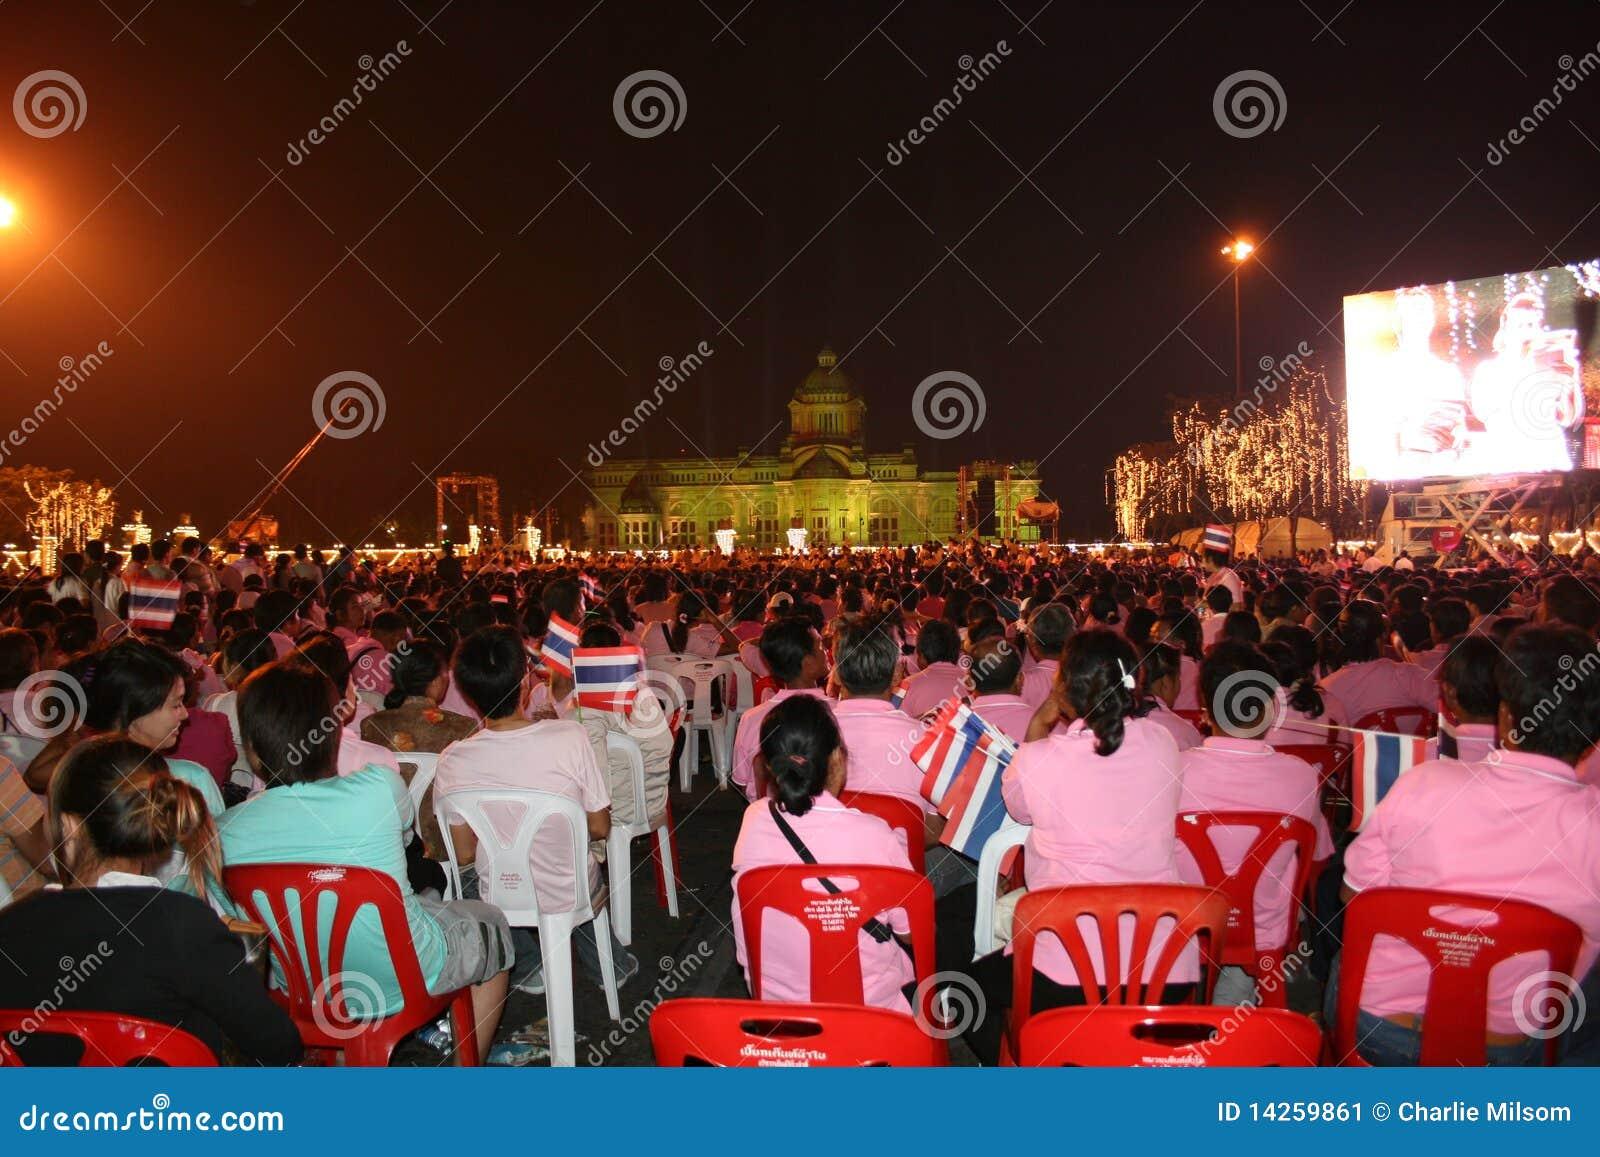 Povos tailandeses no aniversário dos reis, Tailândia.